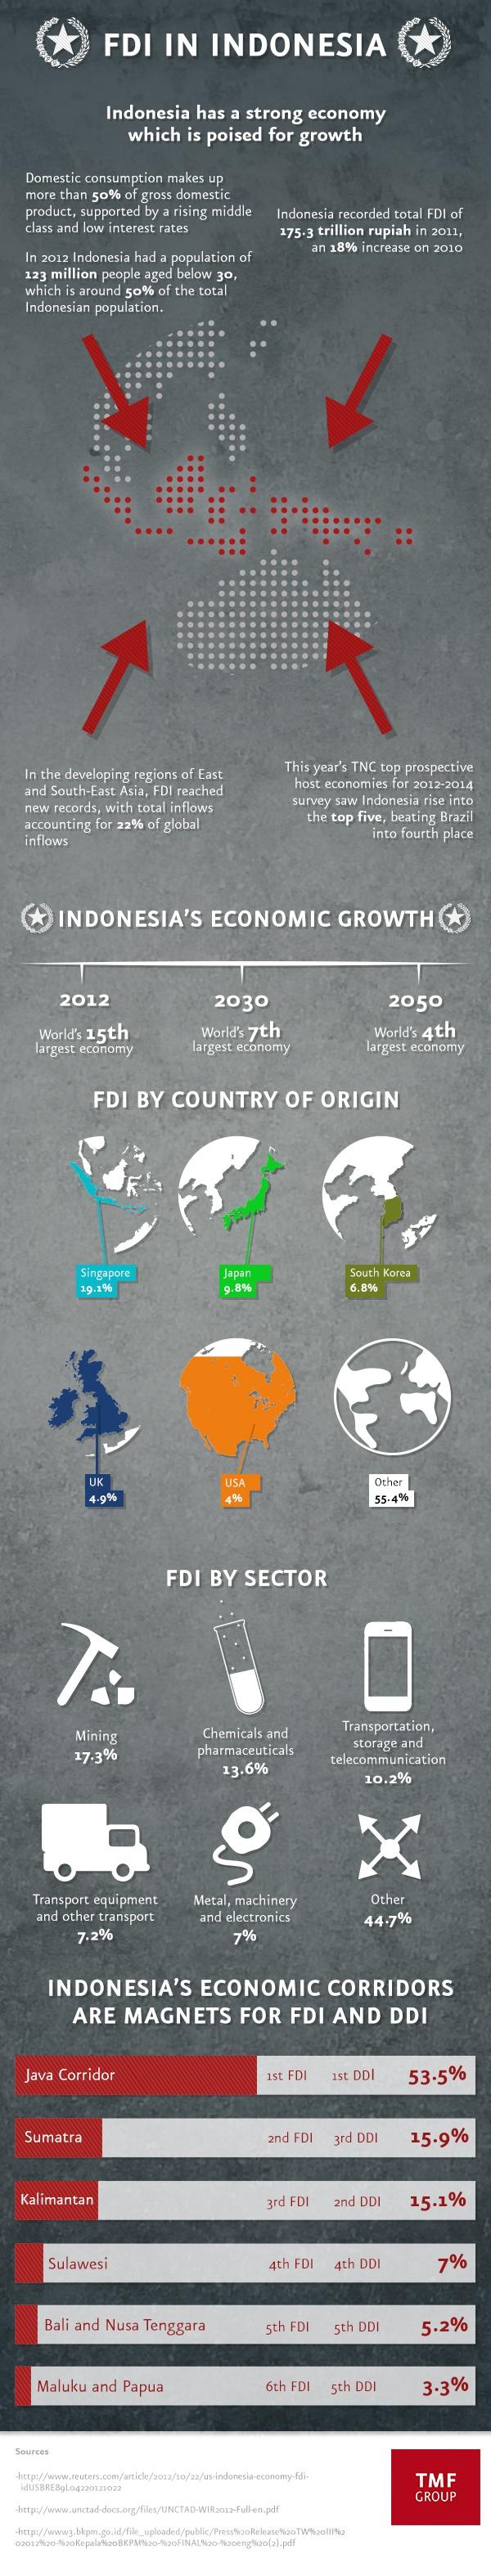 #FDI in #Indonesia #infographic